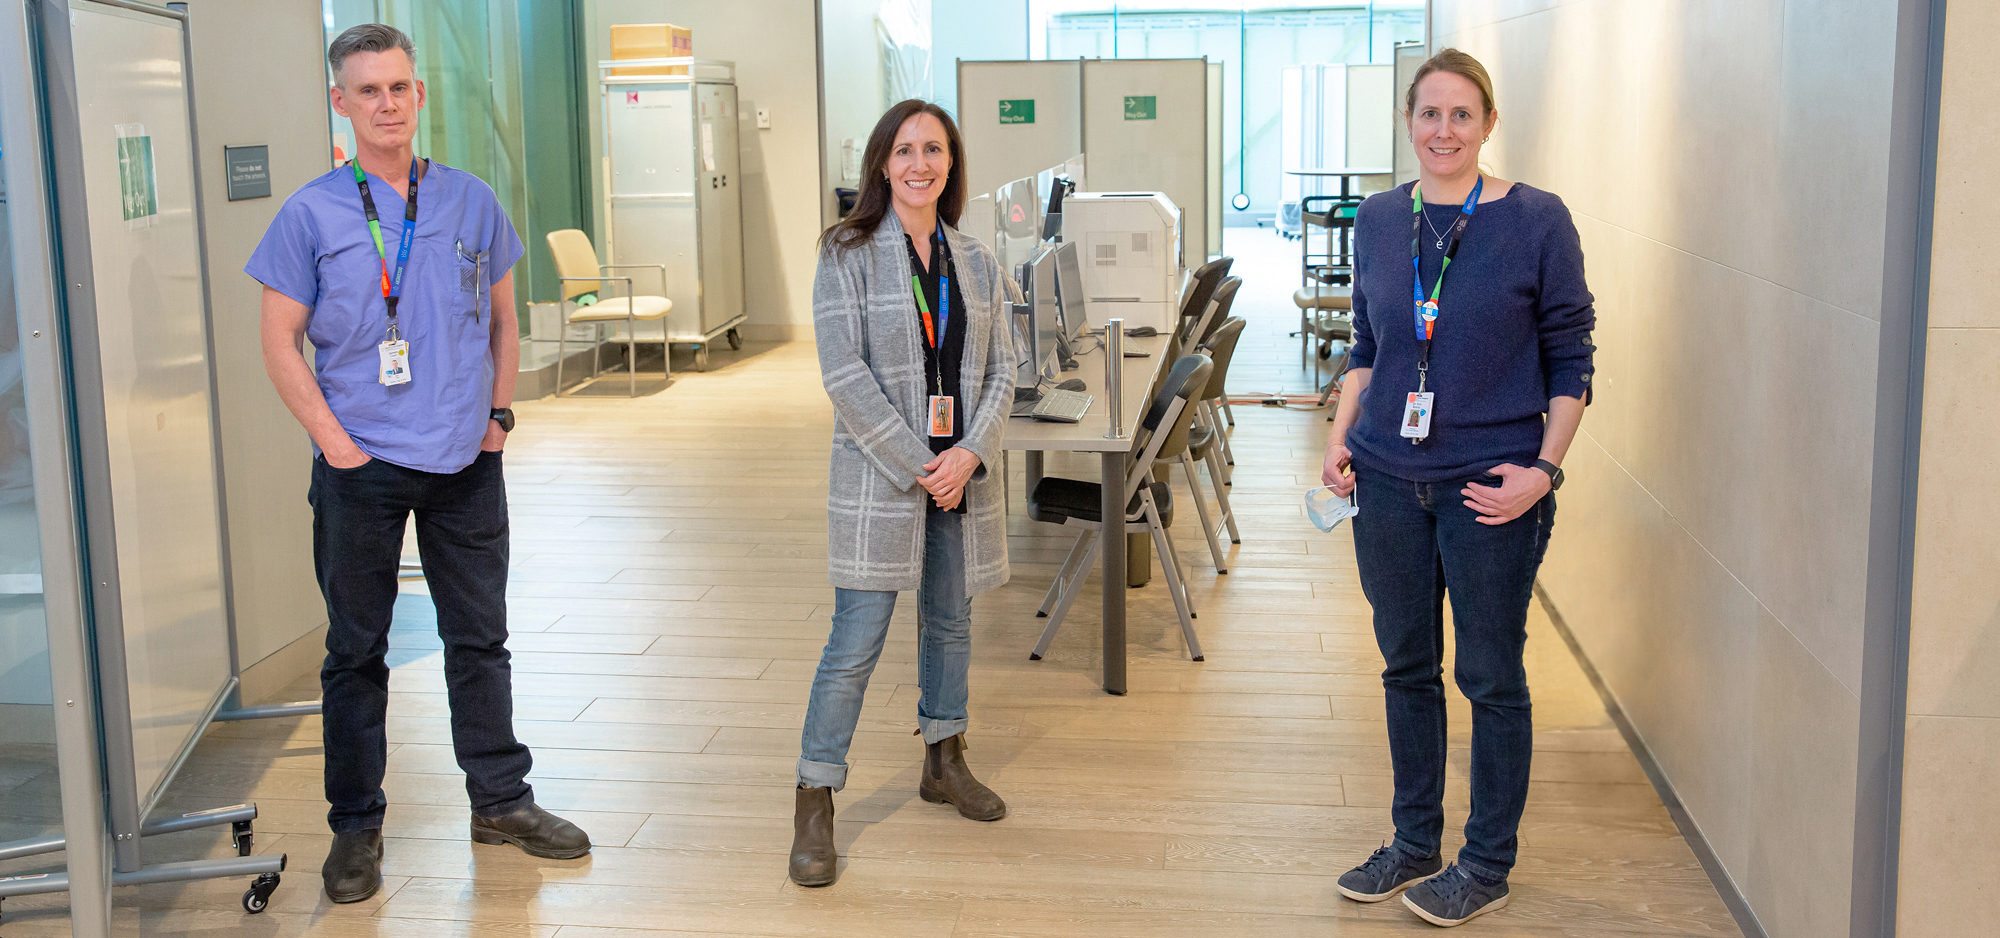 photo of Dr. Erin Bearss, Tanya McDonald and James Clancy